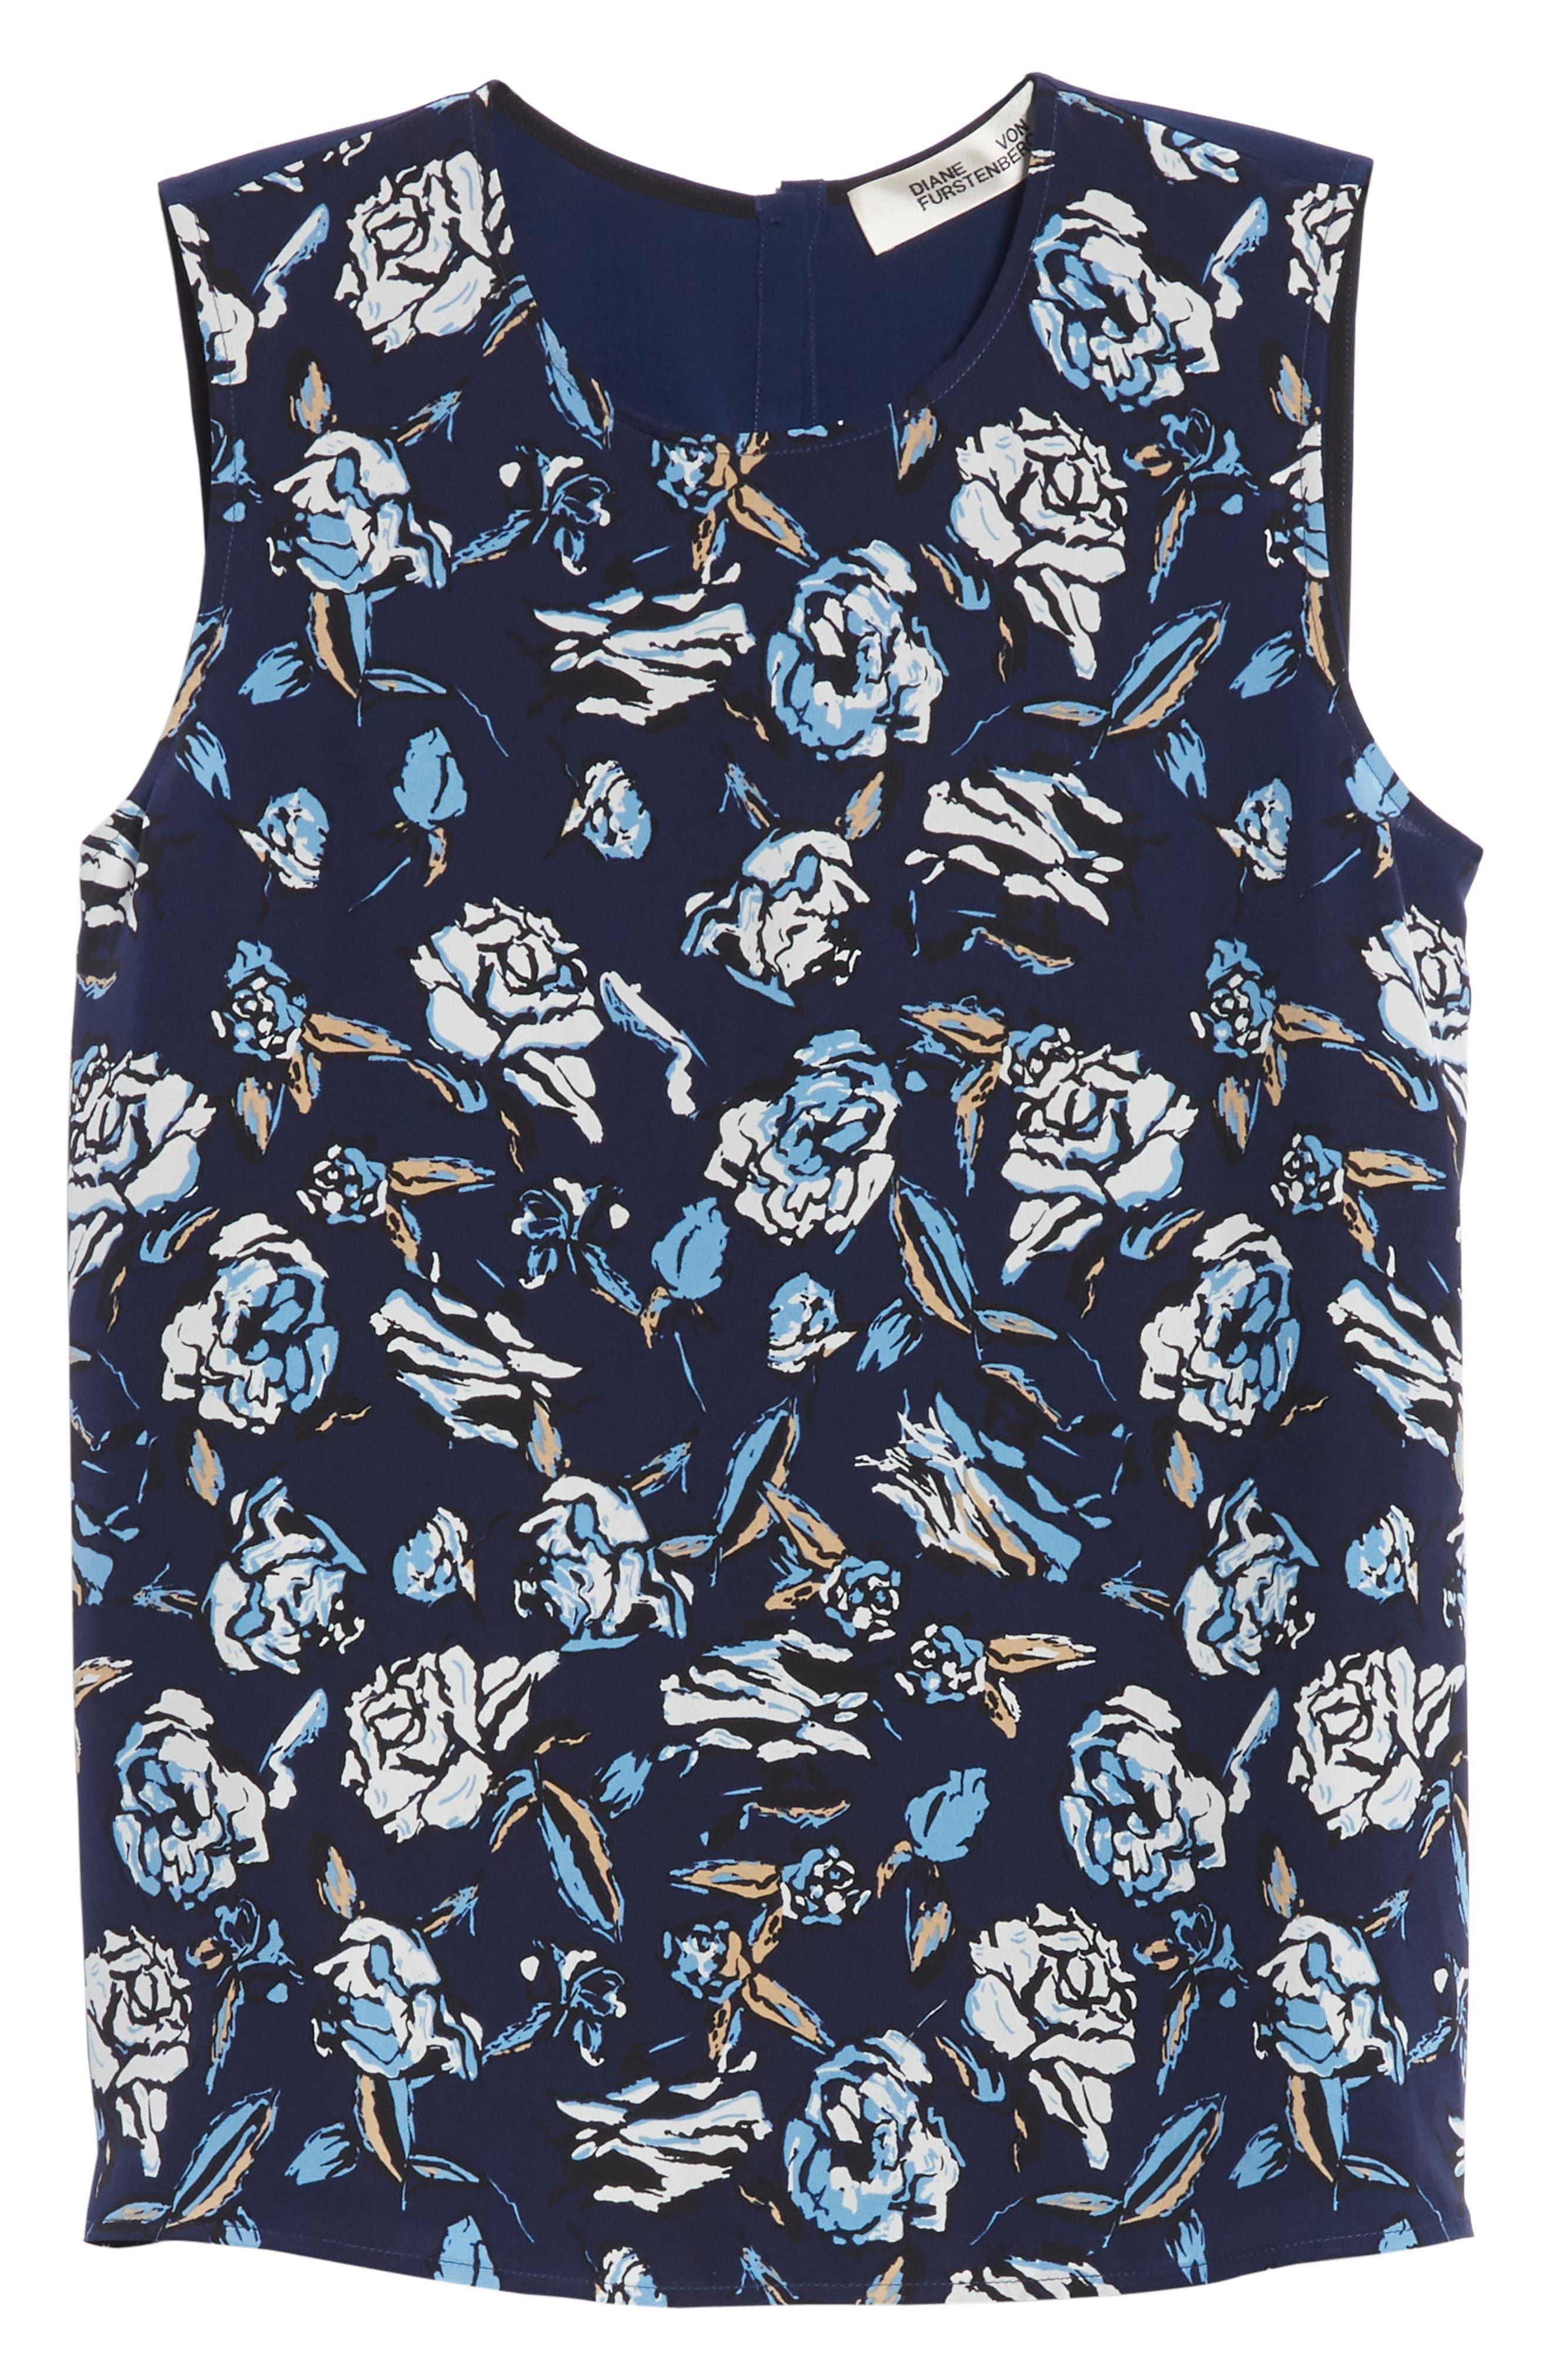 Diane von Furstenberg Floral Print Silk Shell,                             Alternate thumbnail 6, color,                             Ambrose Navy